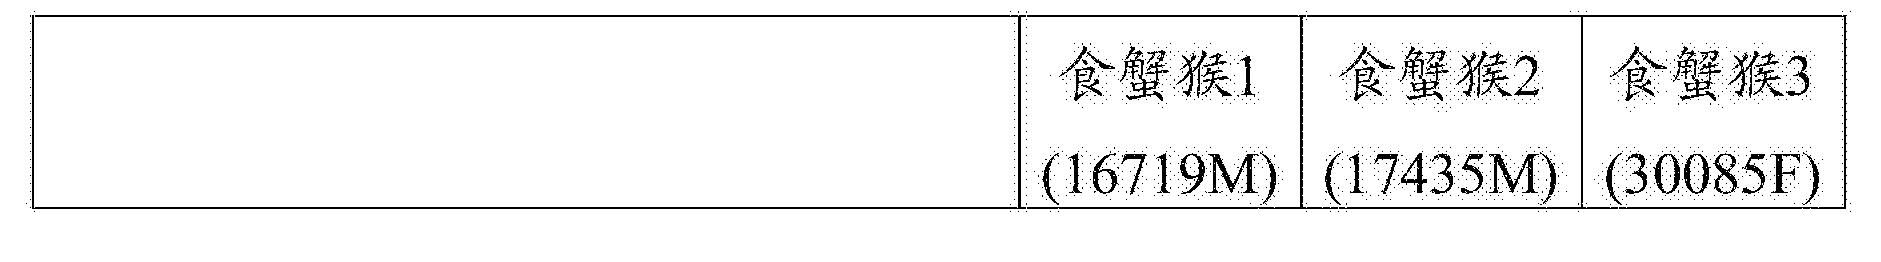 Figure CN107001475AD00663